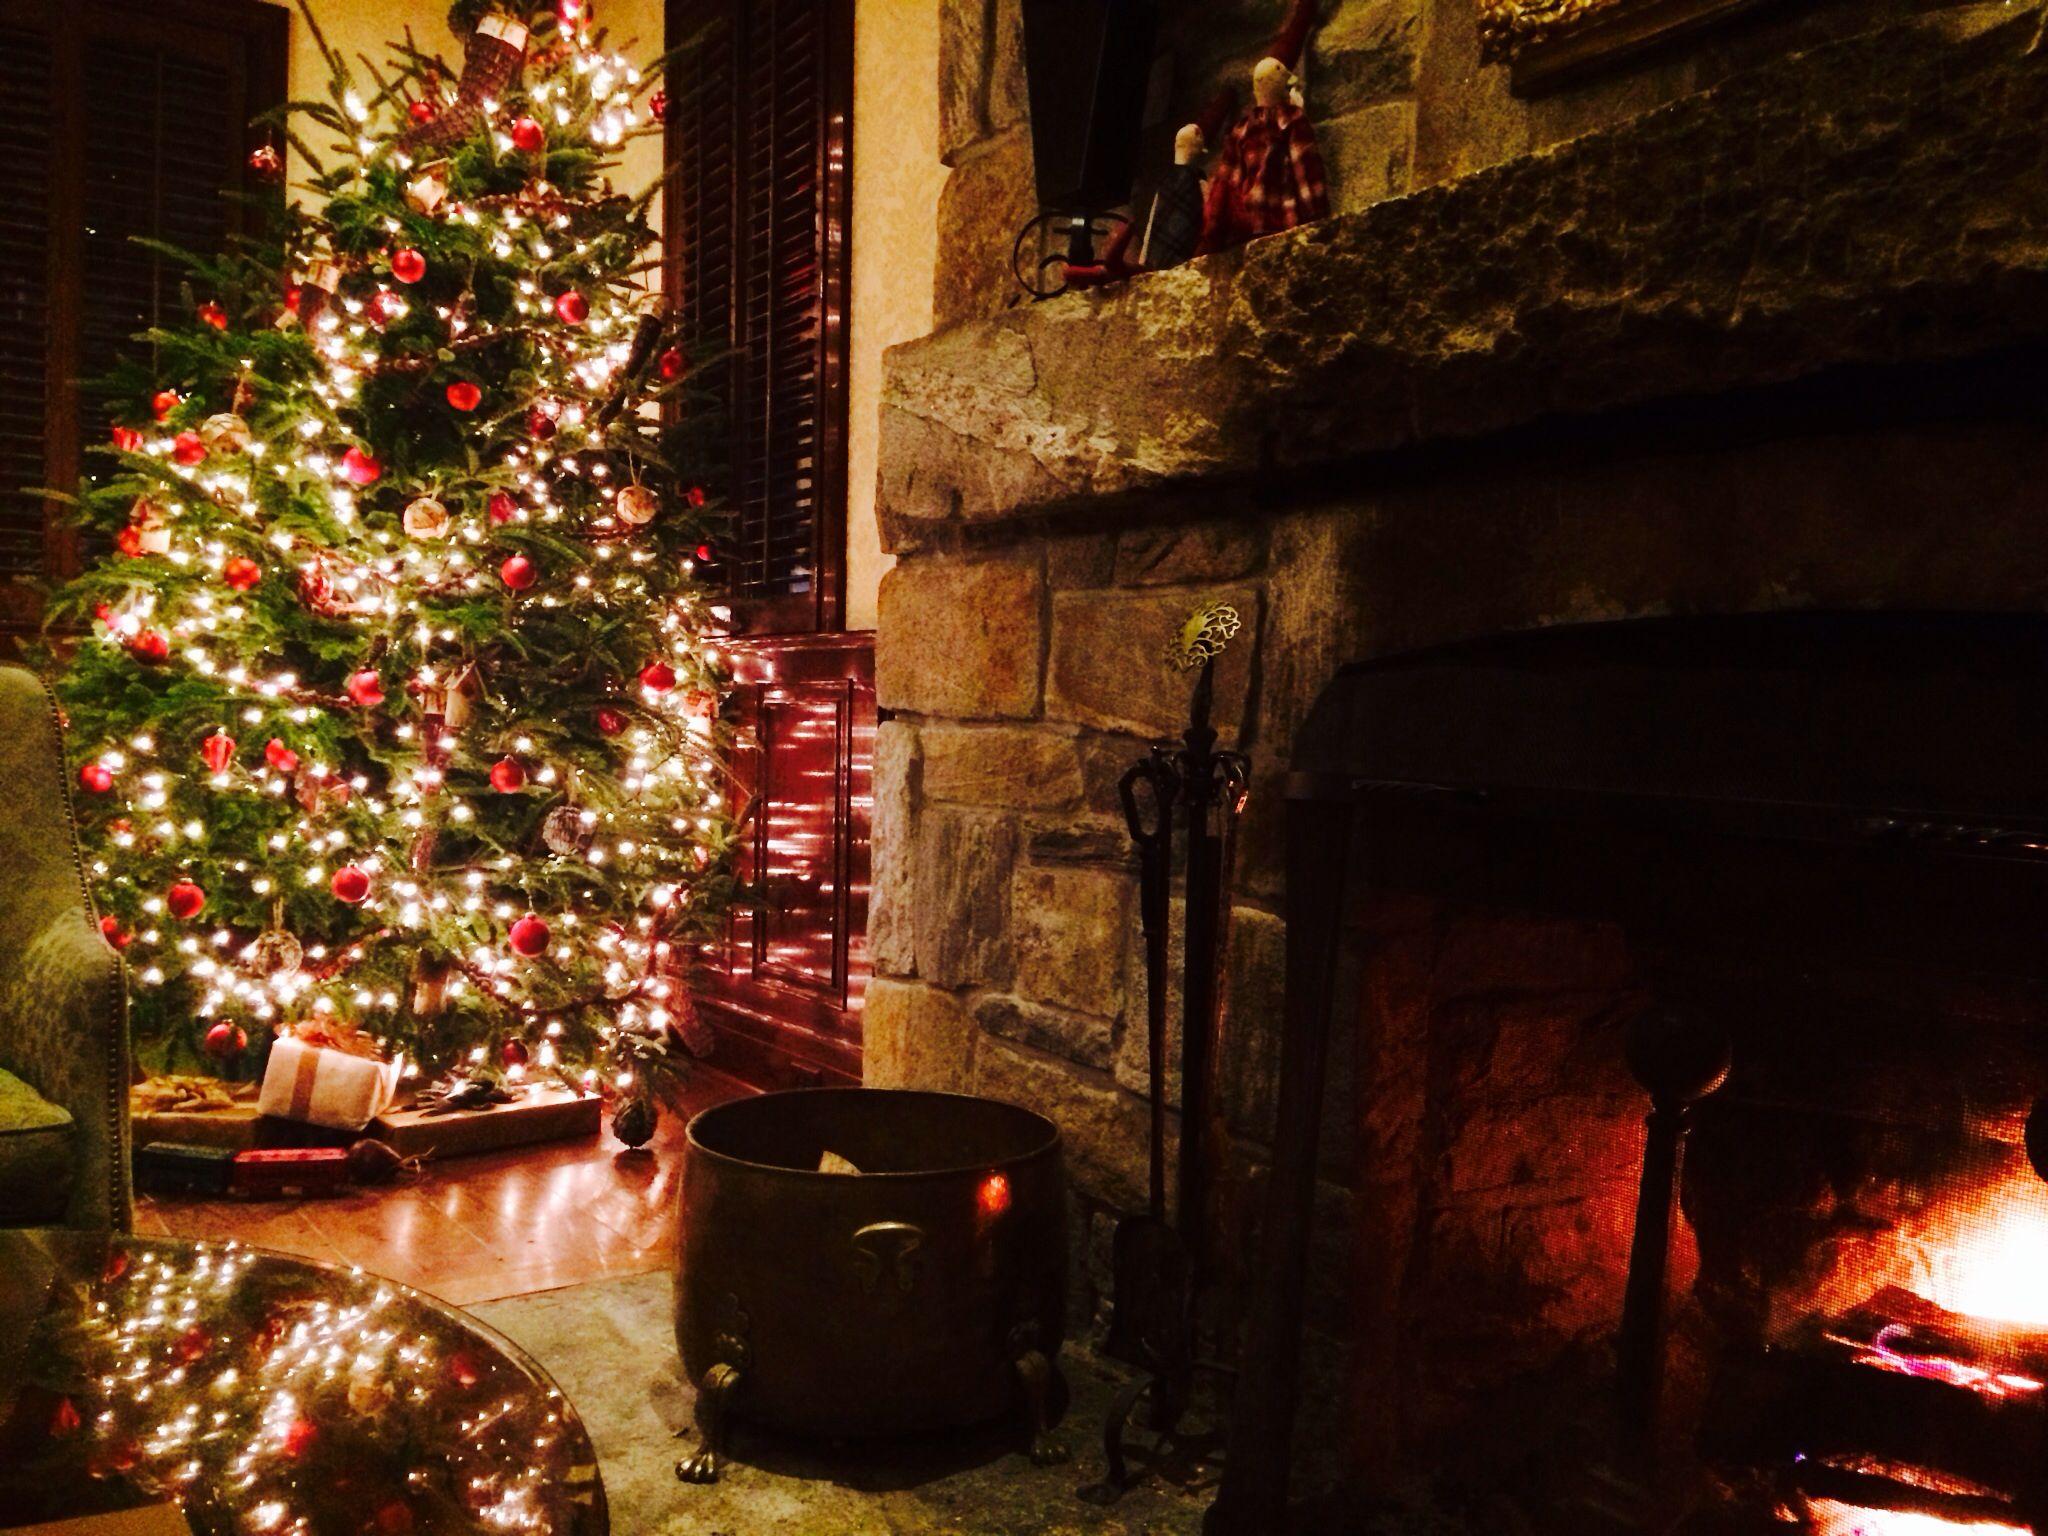 Christmas 2013 Lobby At Old Edwards Inn Highlands Nc Winter